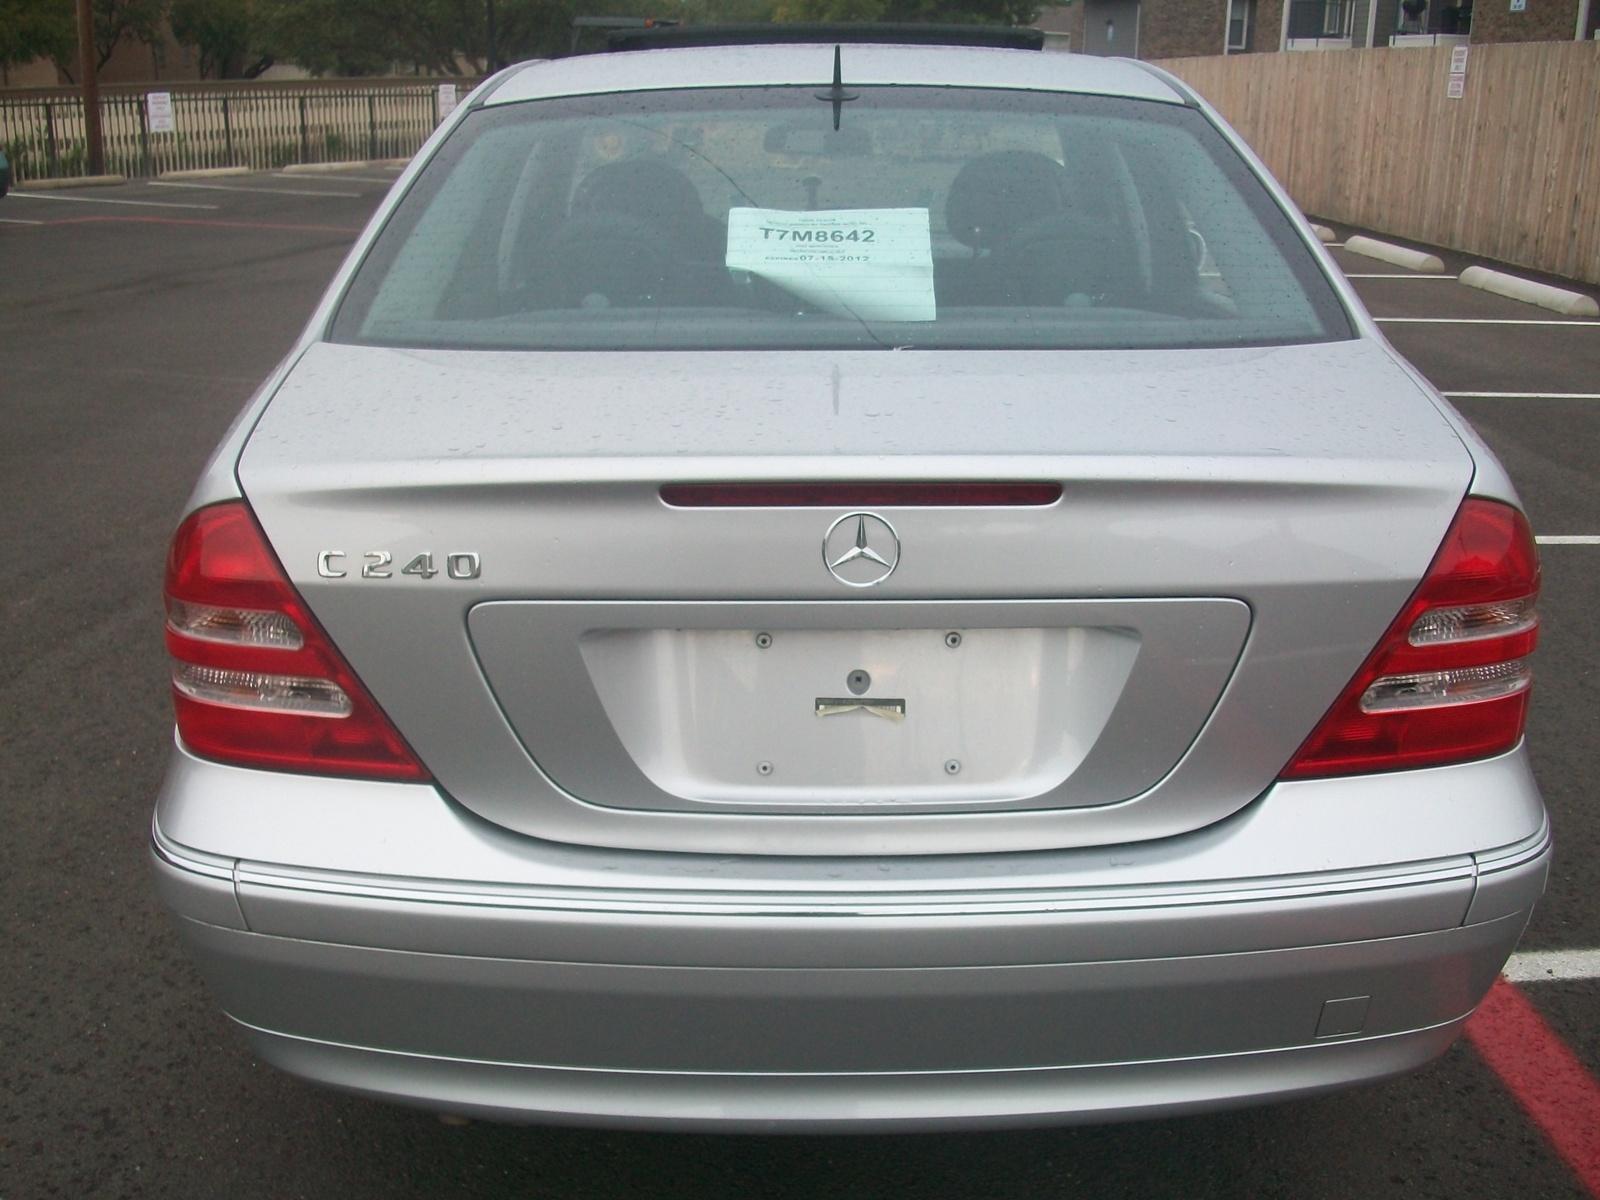 2001 mercedes benz c class for sale in dallas tx cargurus for Mercedes benz used dallas